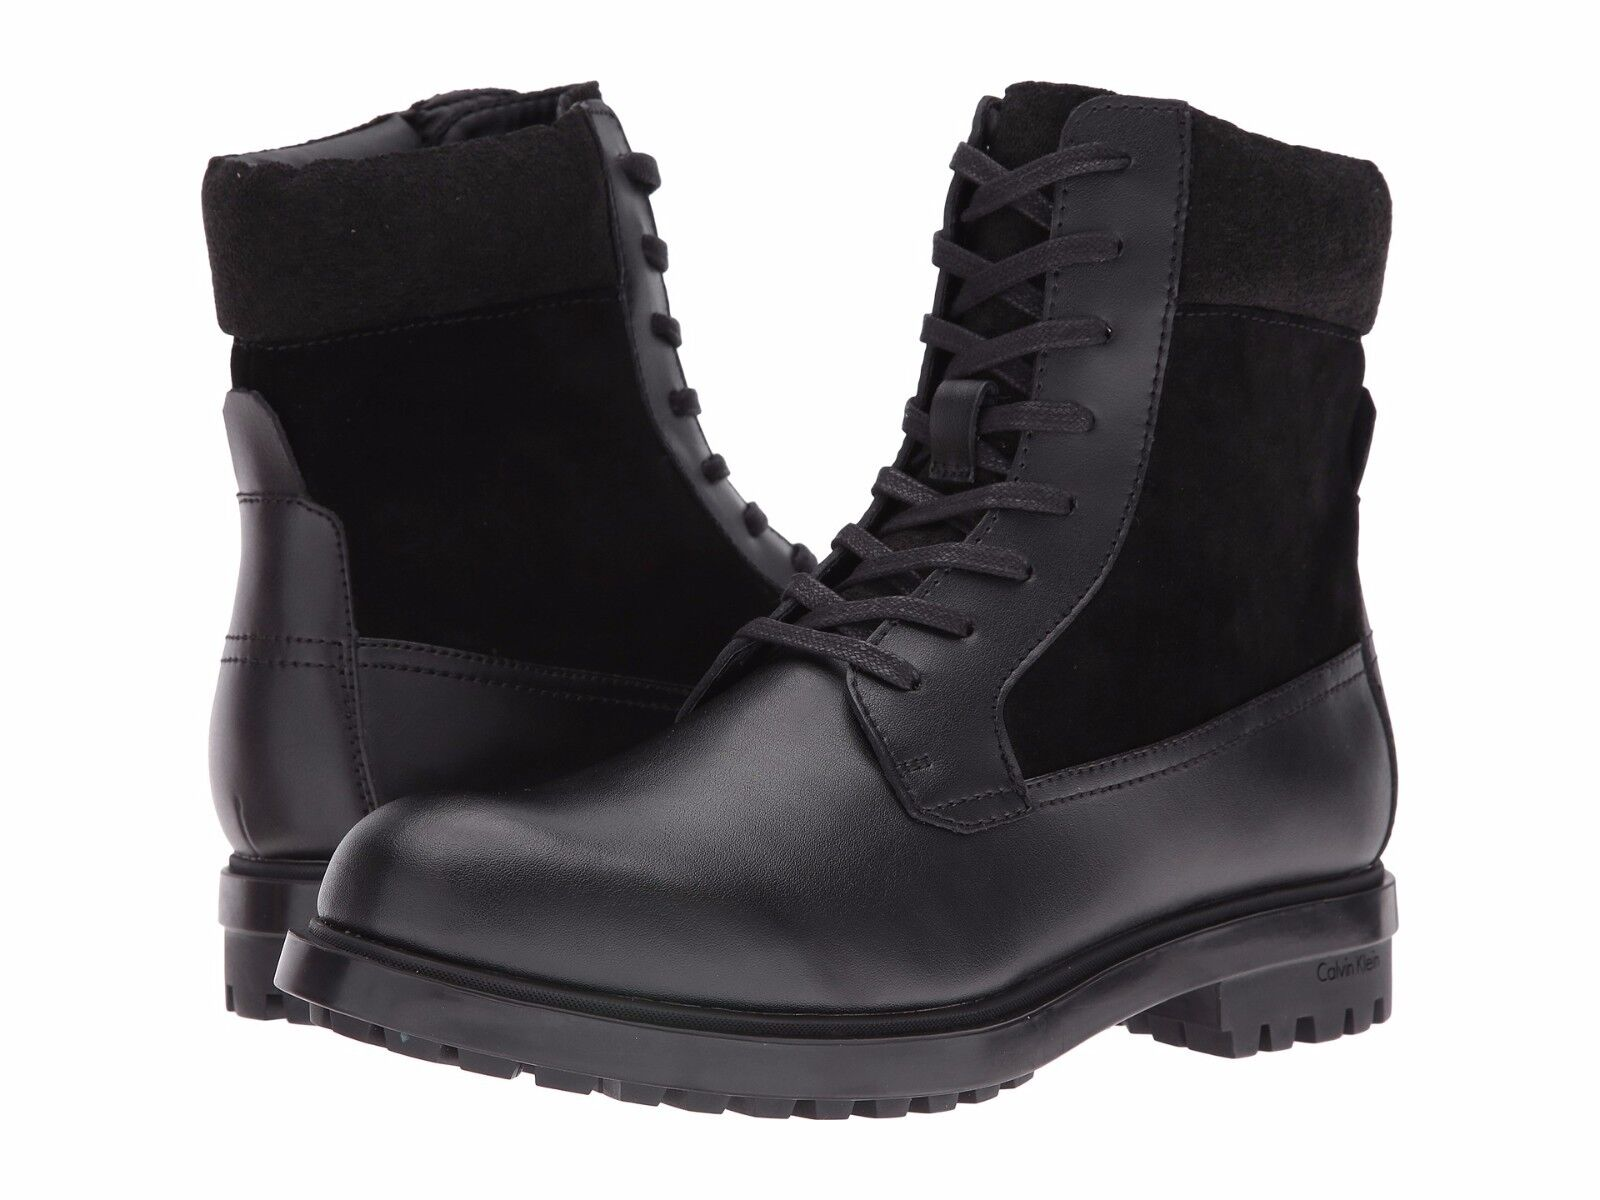 Para hombres Cuero Calvin Klein Klein Klein Gable Bota Negro Sz 9.5 MSRP faa0db